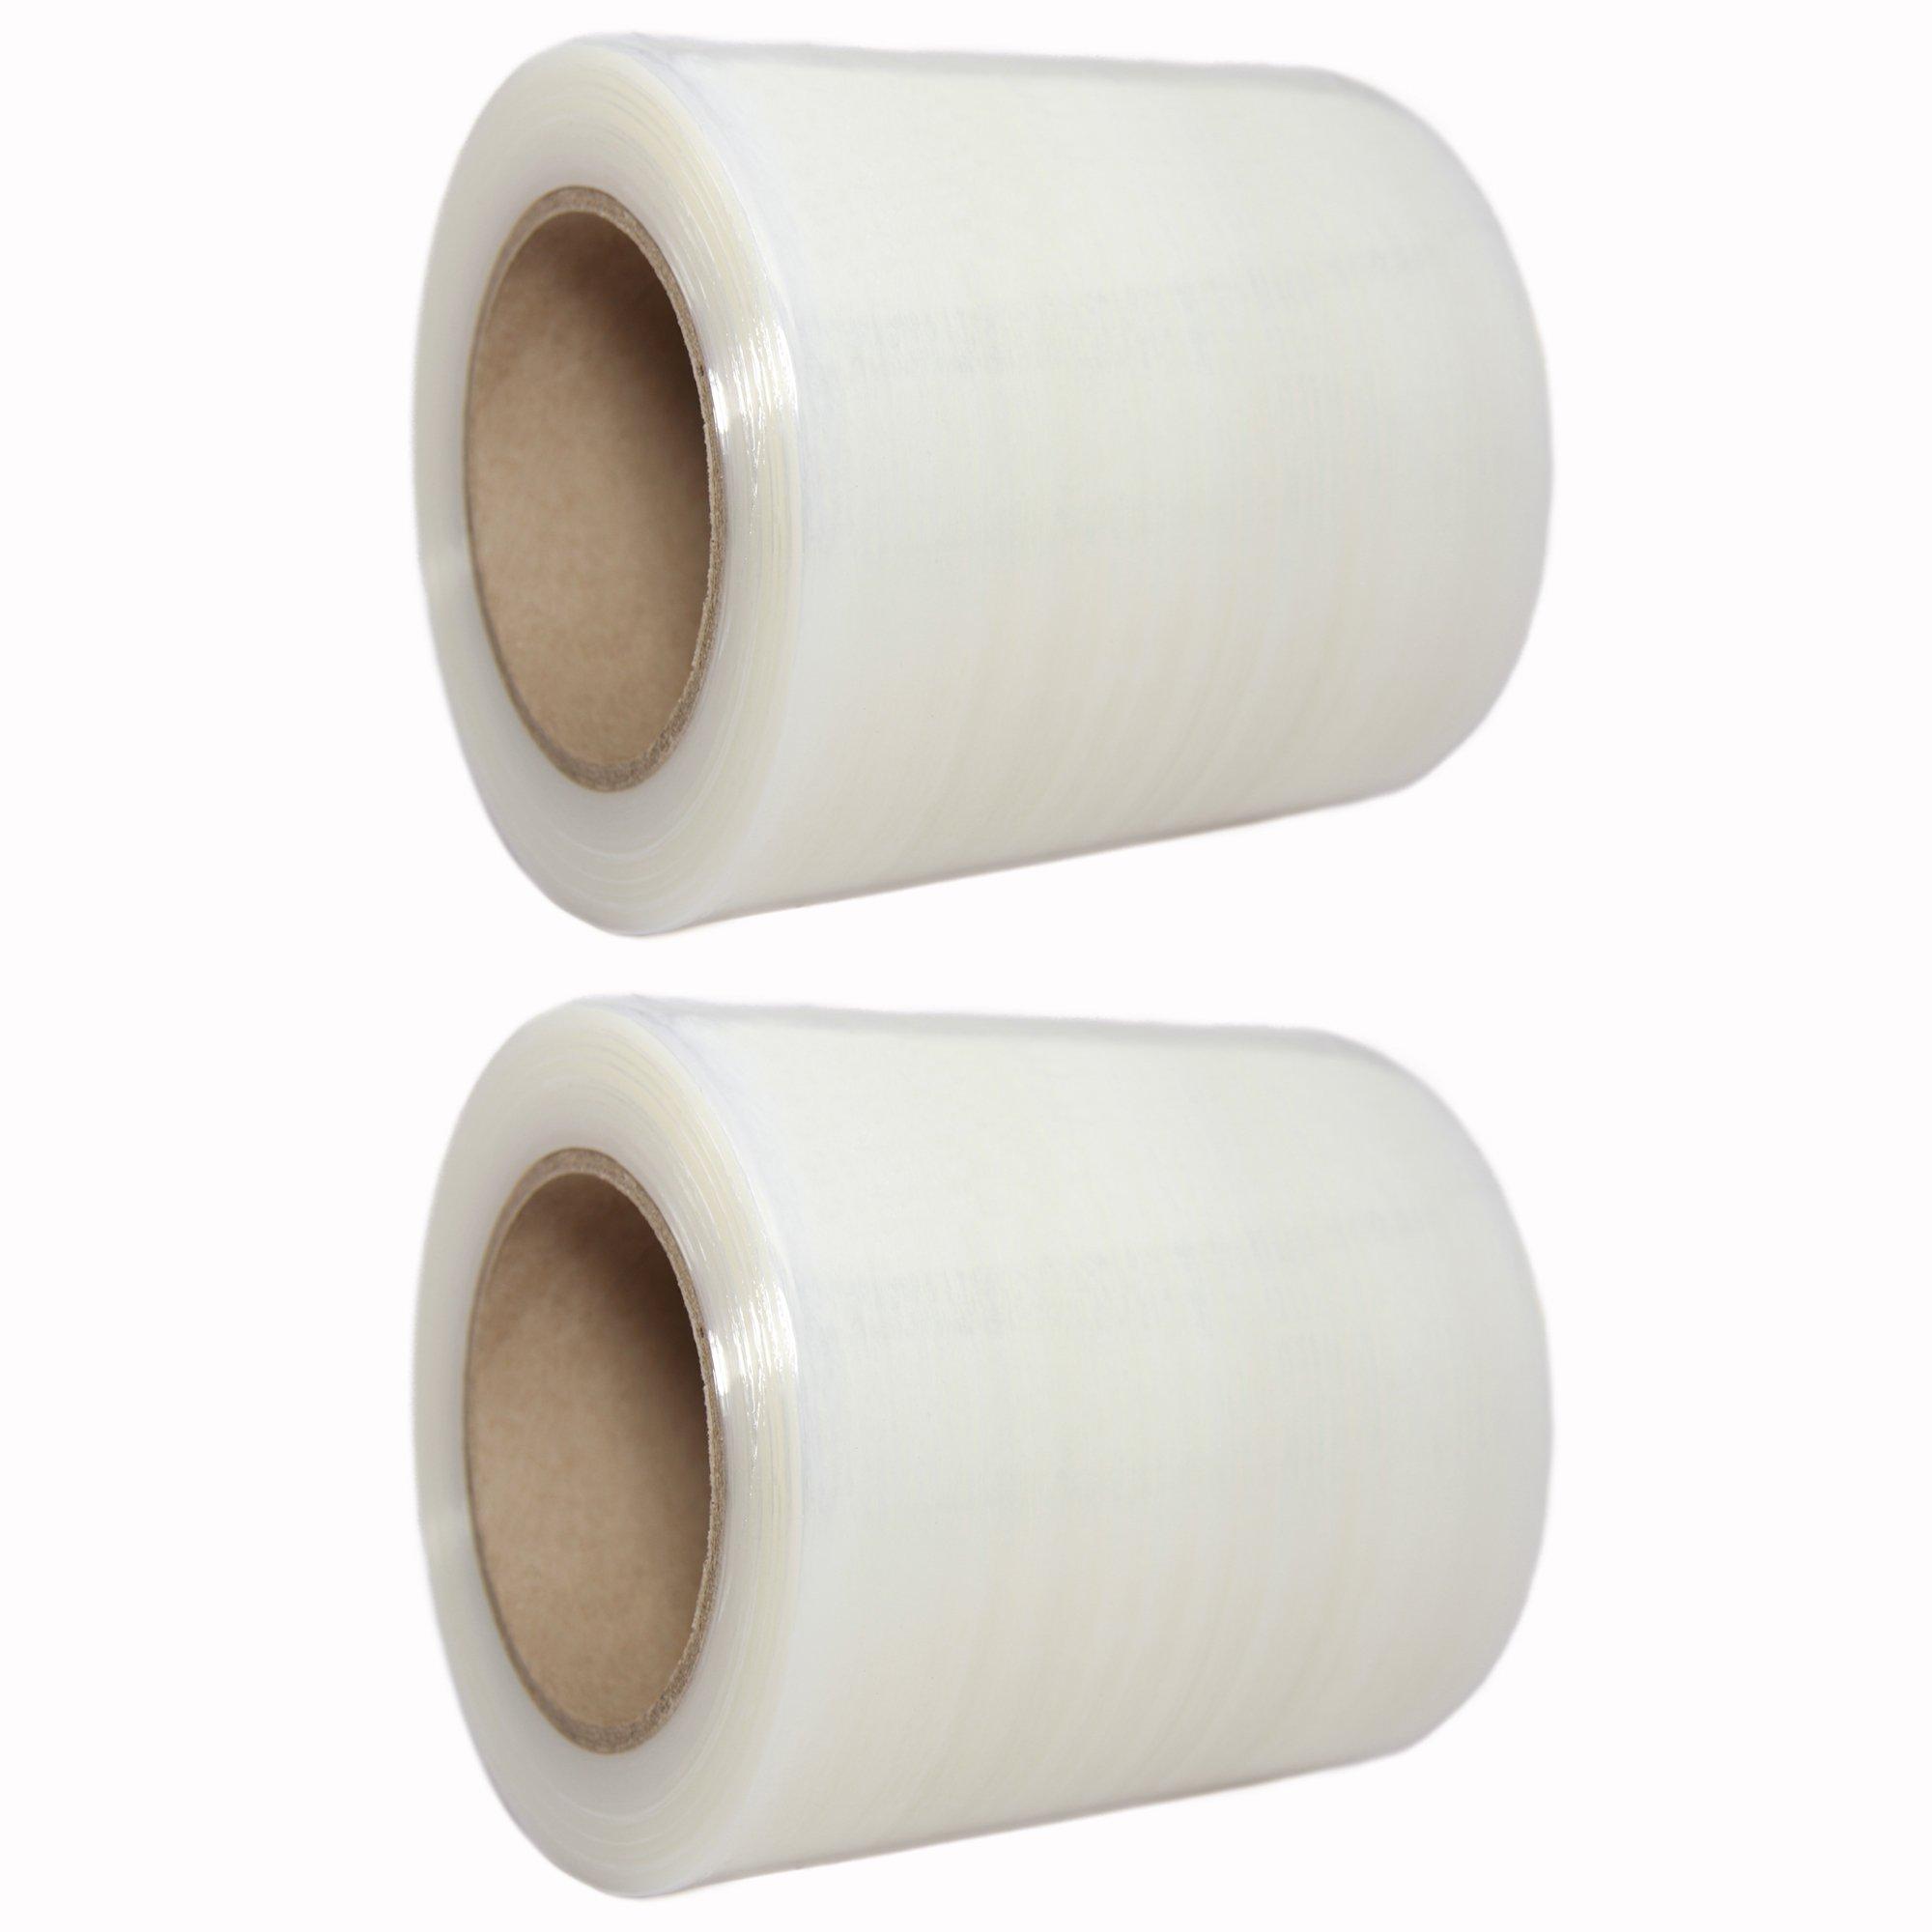 "TotalPack Shrink Mini Wrap: Stretch Film Plastic Wrap 2 Pack - Industrial Strength Hand Stretch Wrap, 5"" x 1,000 FT, 80 Gauge Shrink Film / Pallet Wrap"